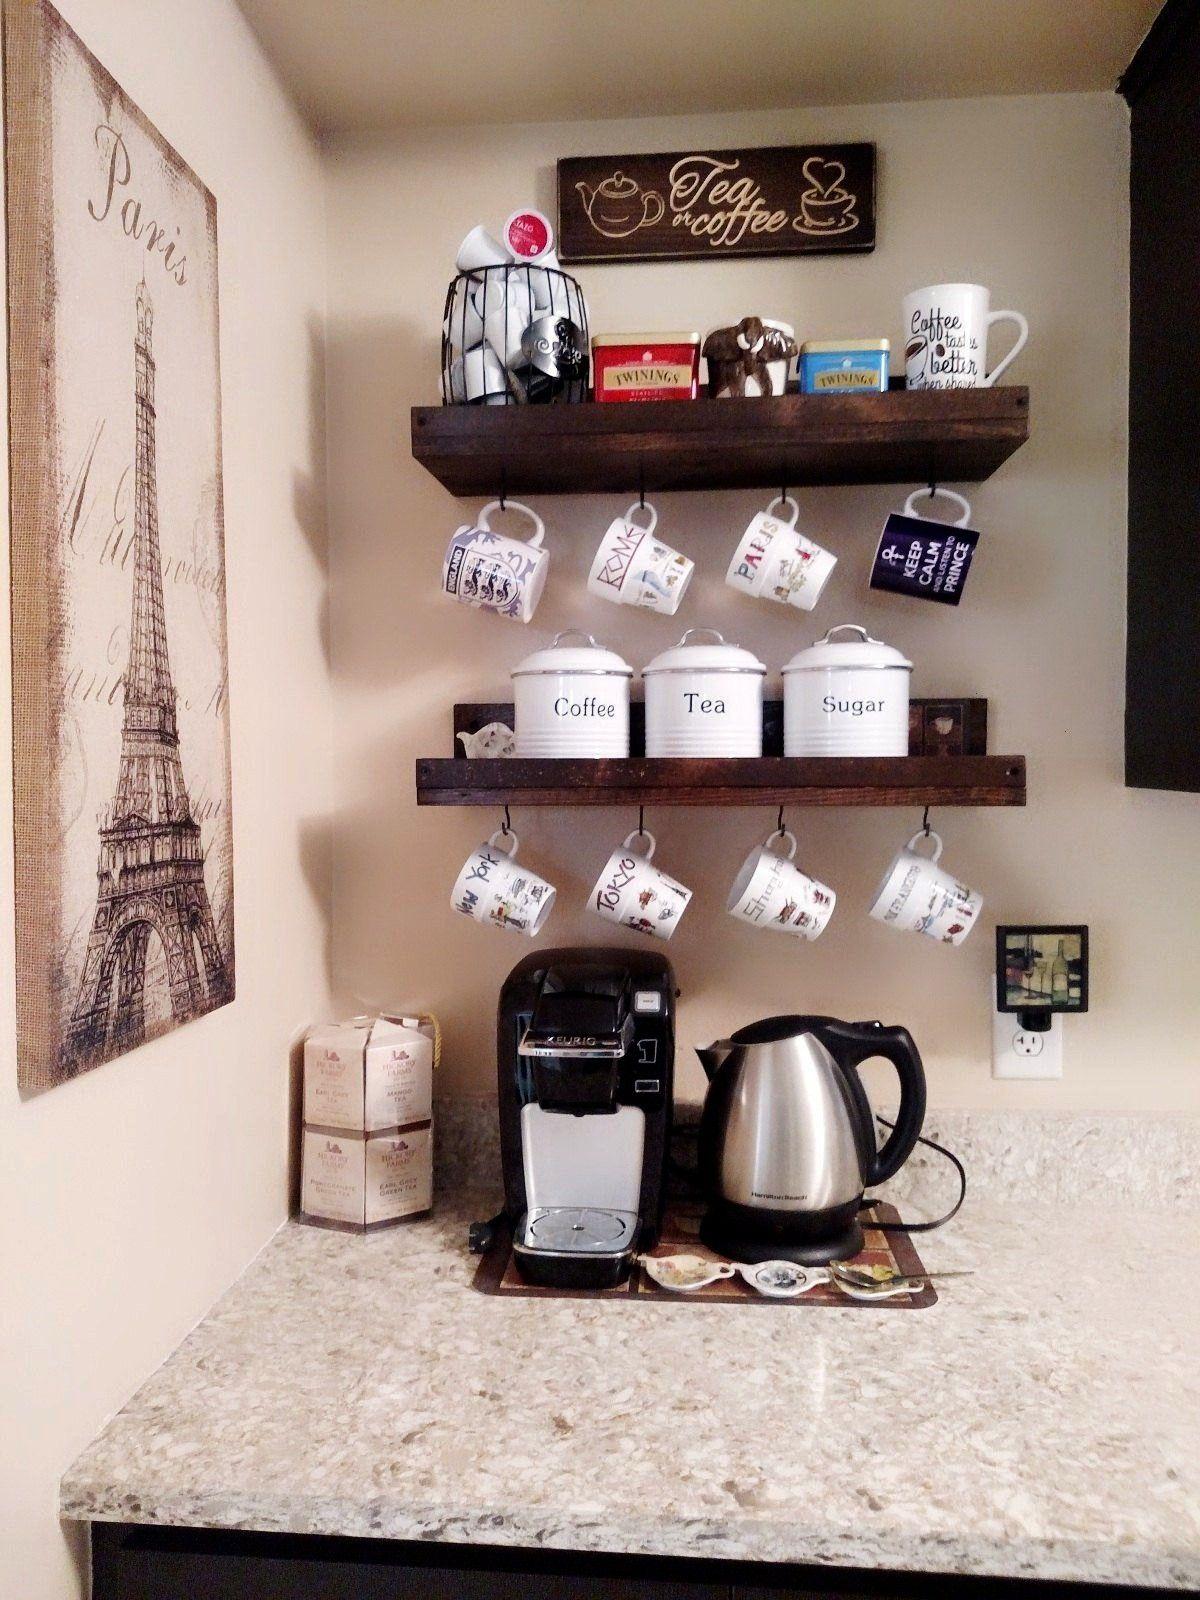 Organizer Display Mounted Rustic Coffee Holder Shelf Decor Rack With Wall Bar Mug Cuprusti In 2020 Coffee Bar Home Home Coffee Stations Coffee Bar Design